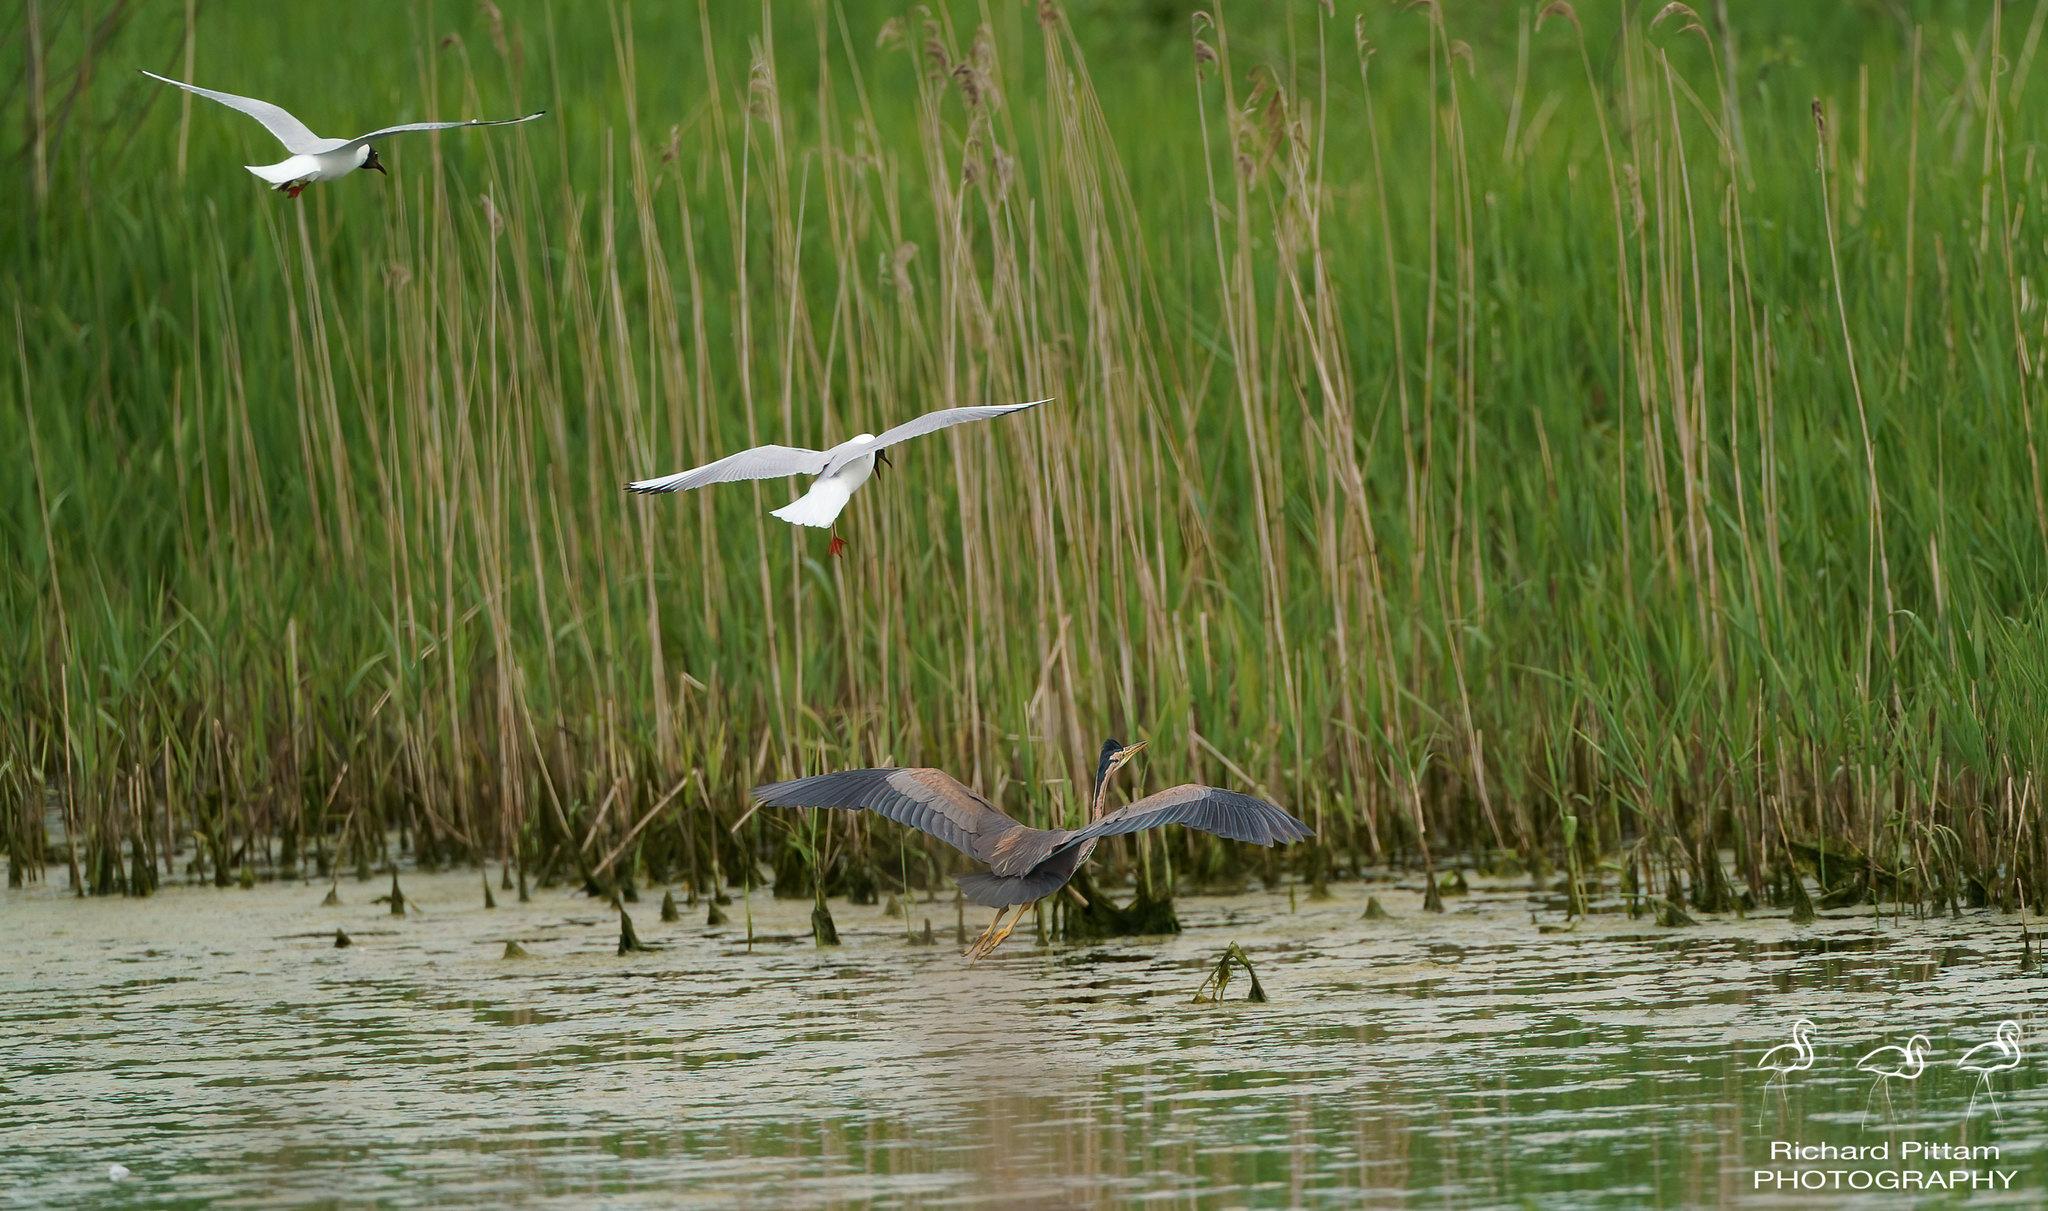 Purple Heron being chased by Black-headed Gulls